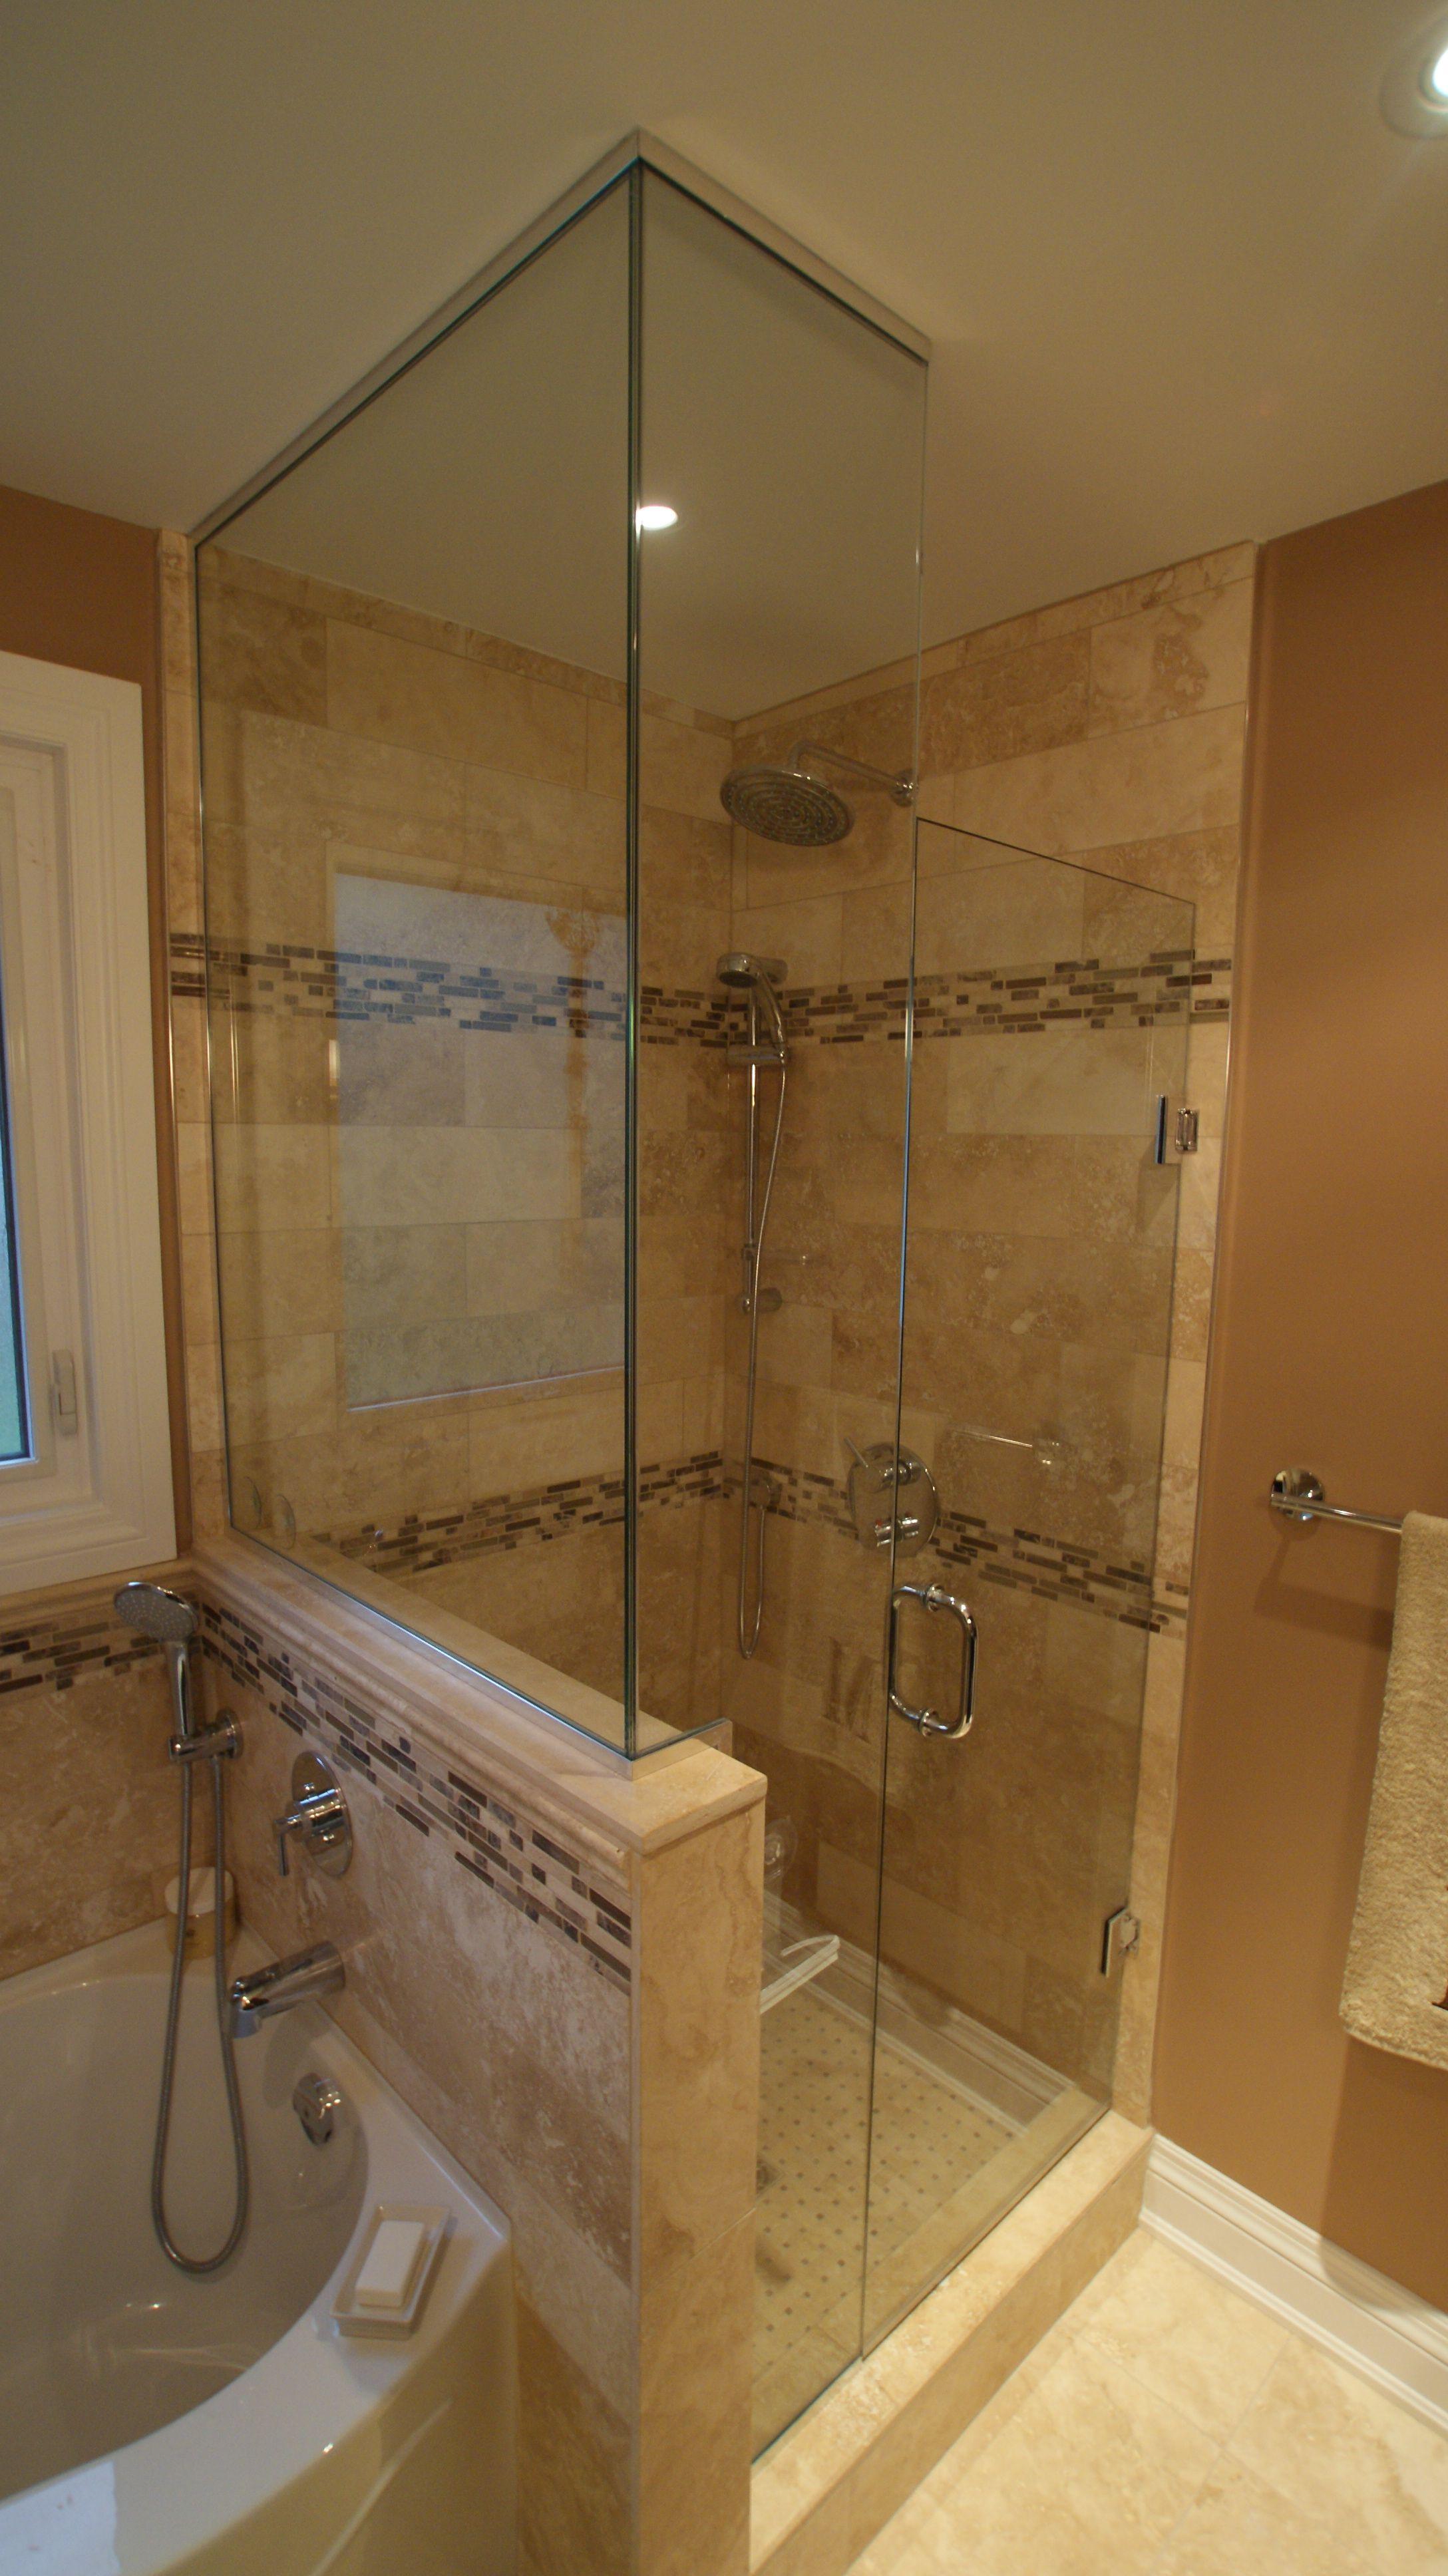 Stand Up Shower Jacuzzi Tub Bathroom Design Small Jet Tub